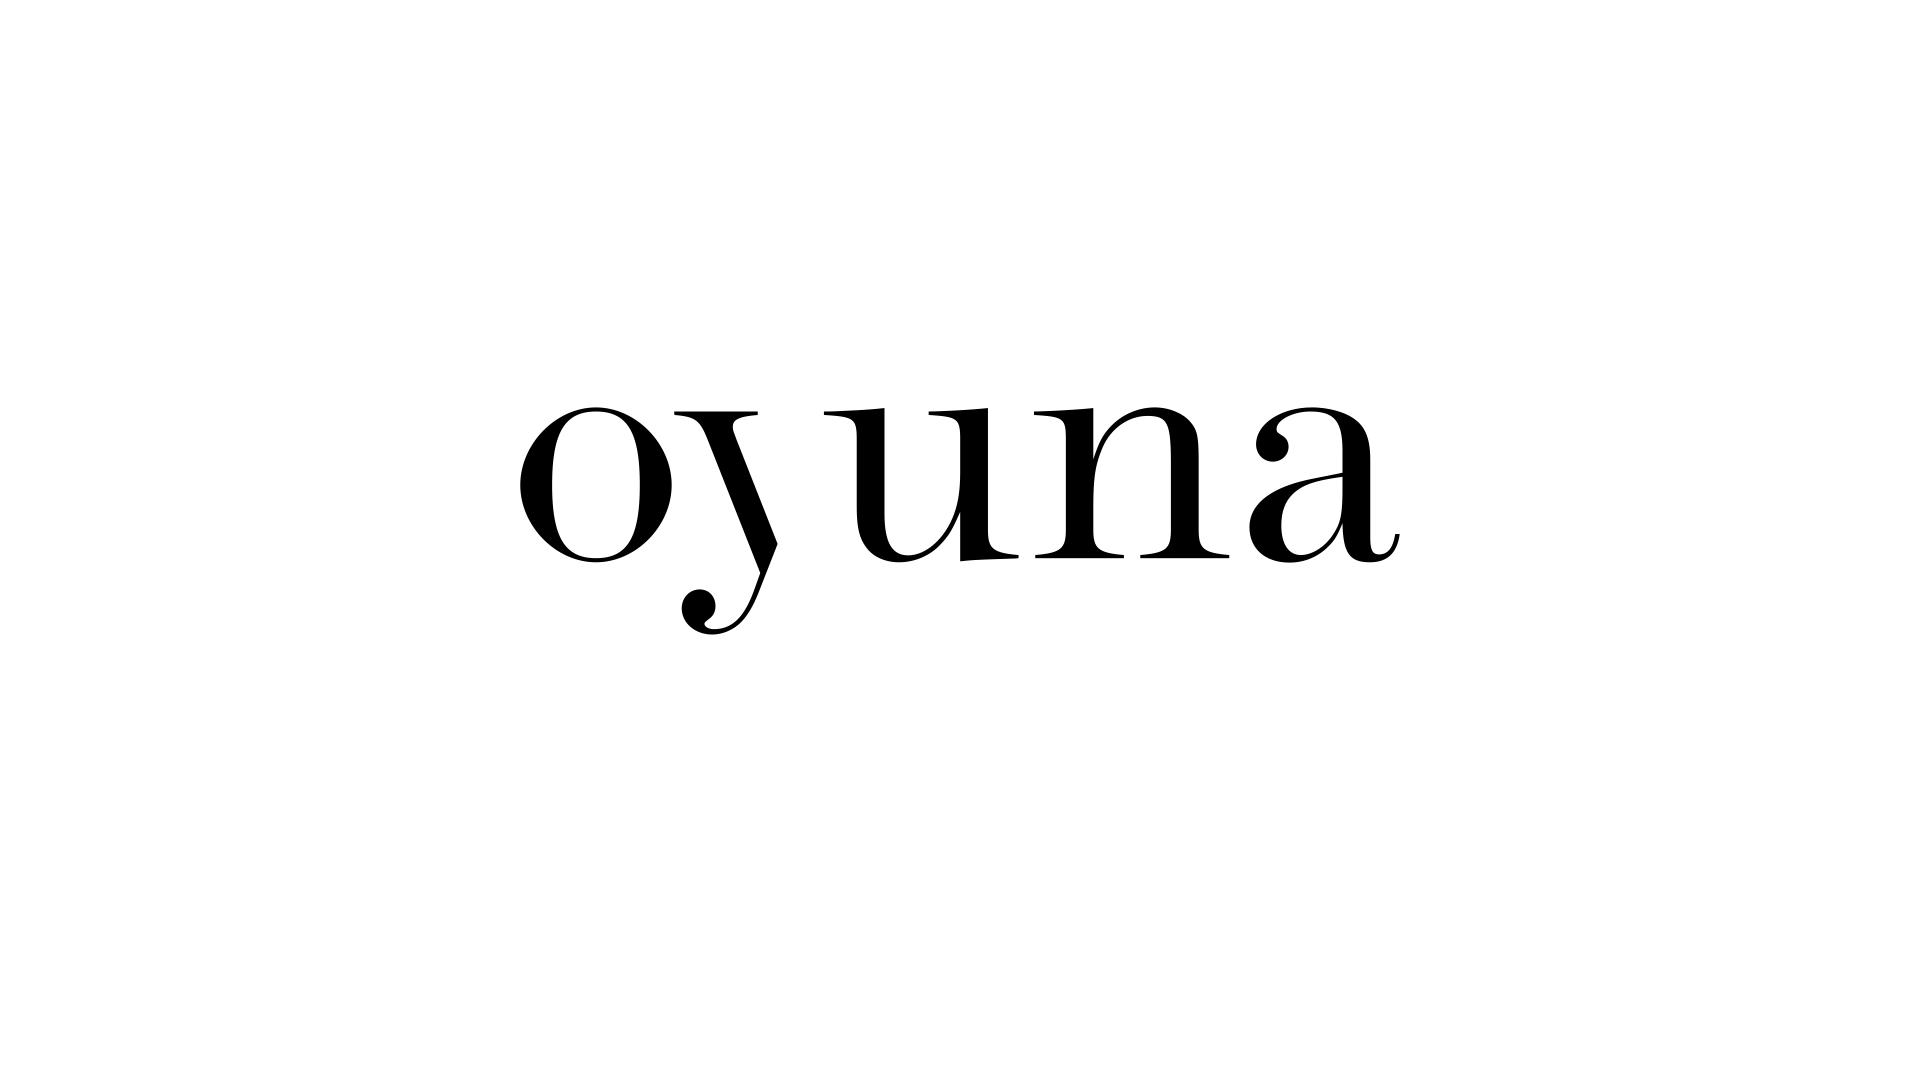 Oyuna Cashmere Logotype | Thomas Manss & Company